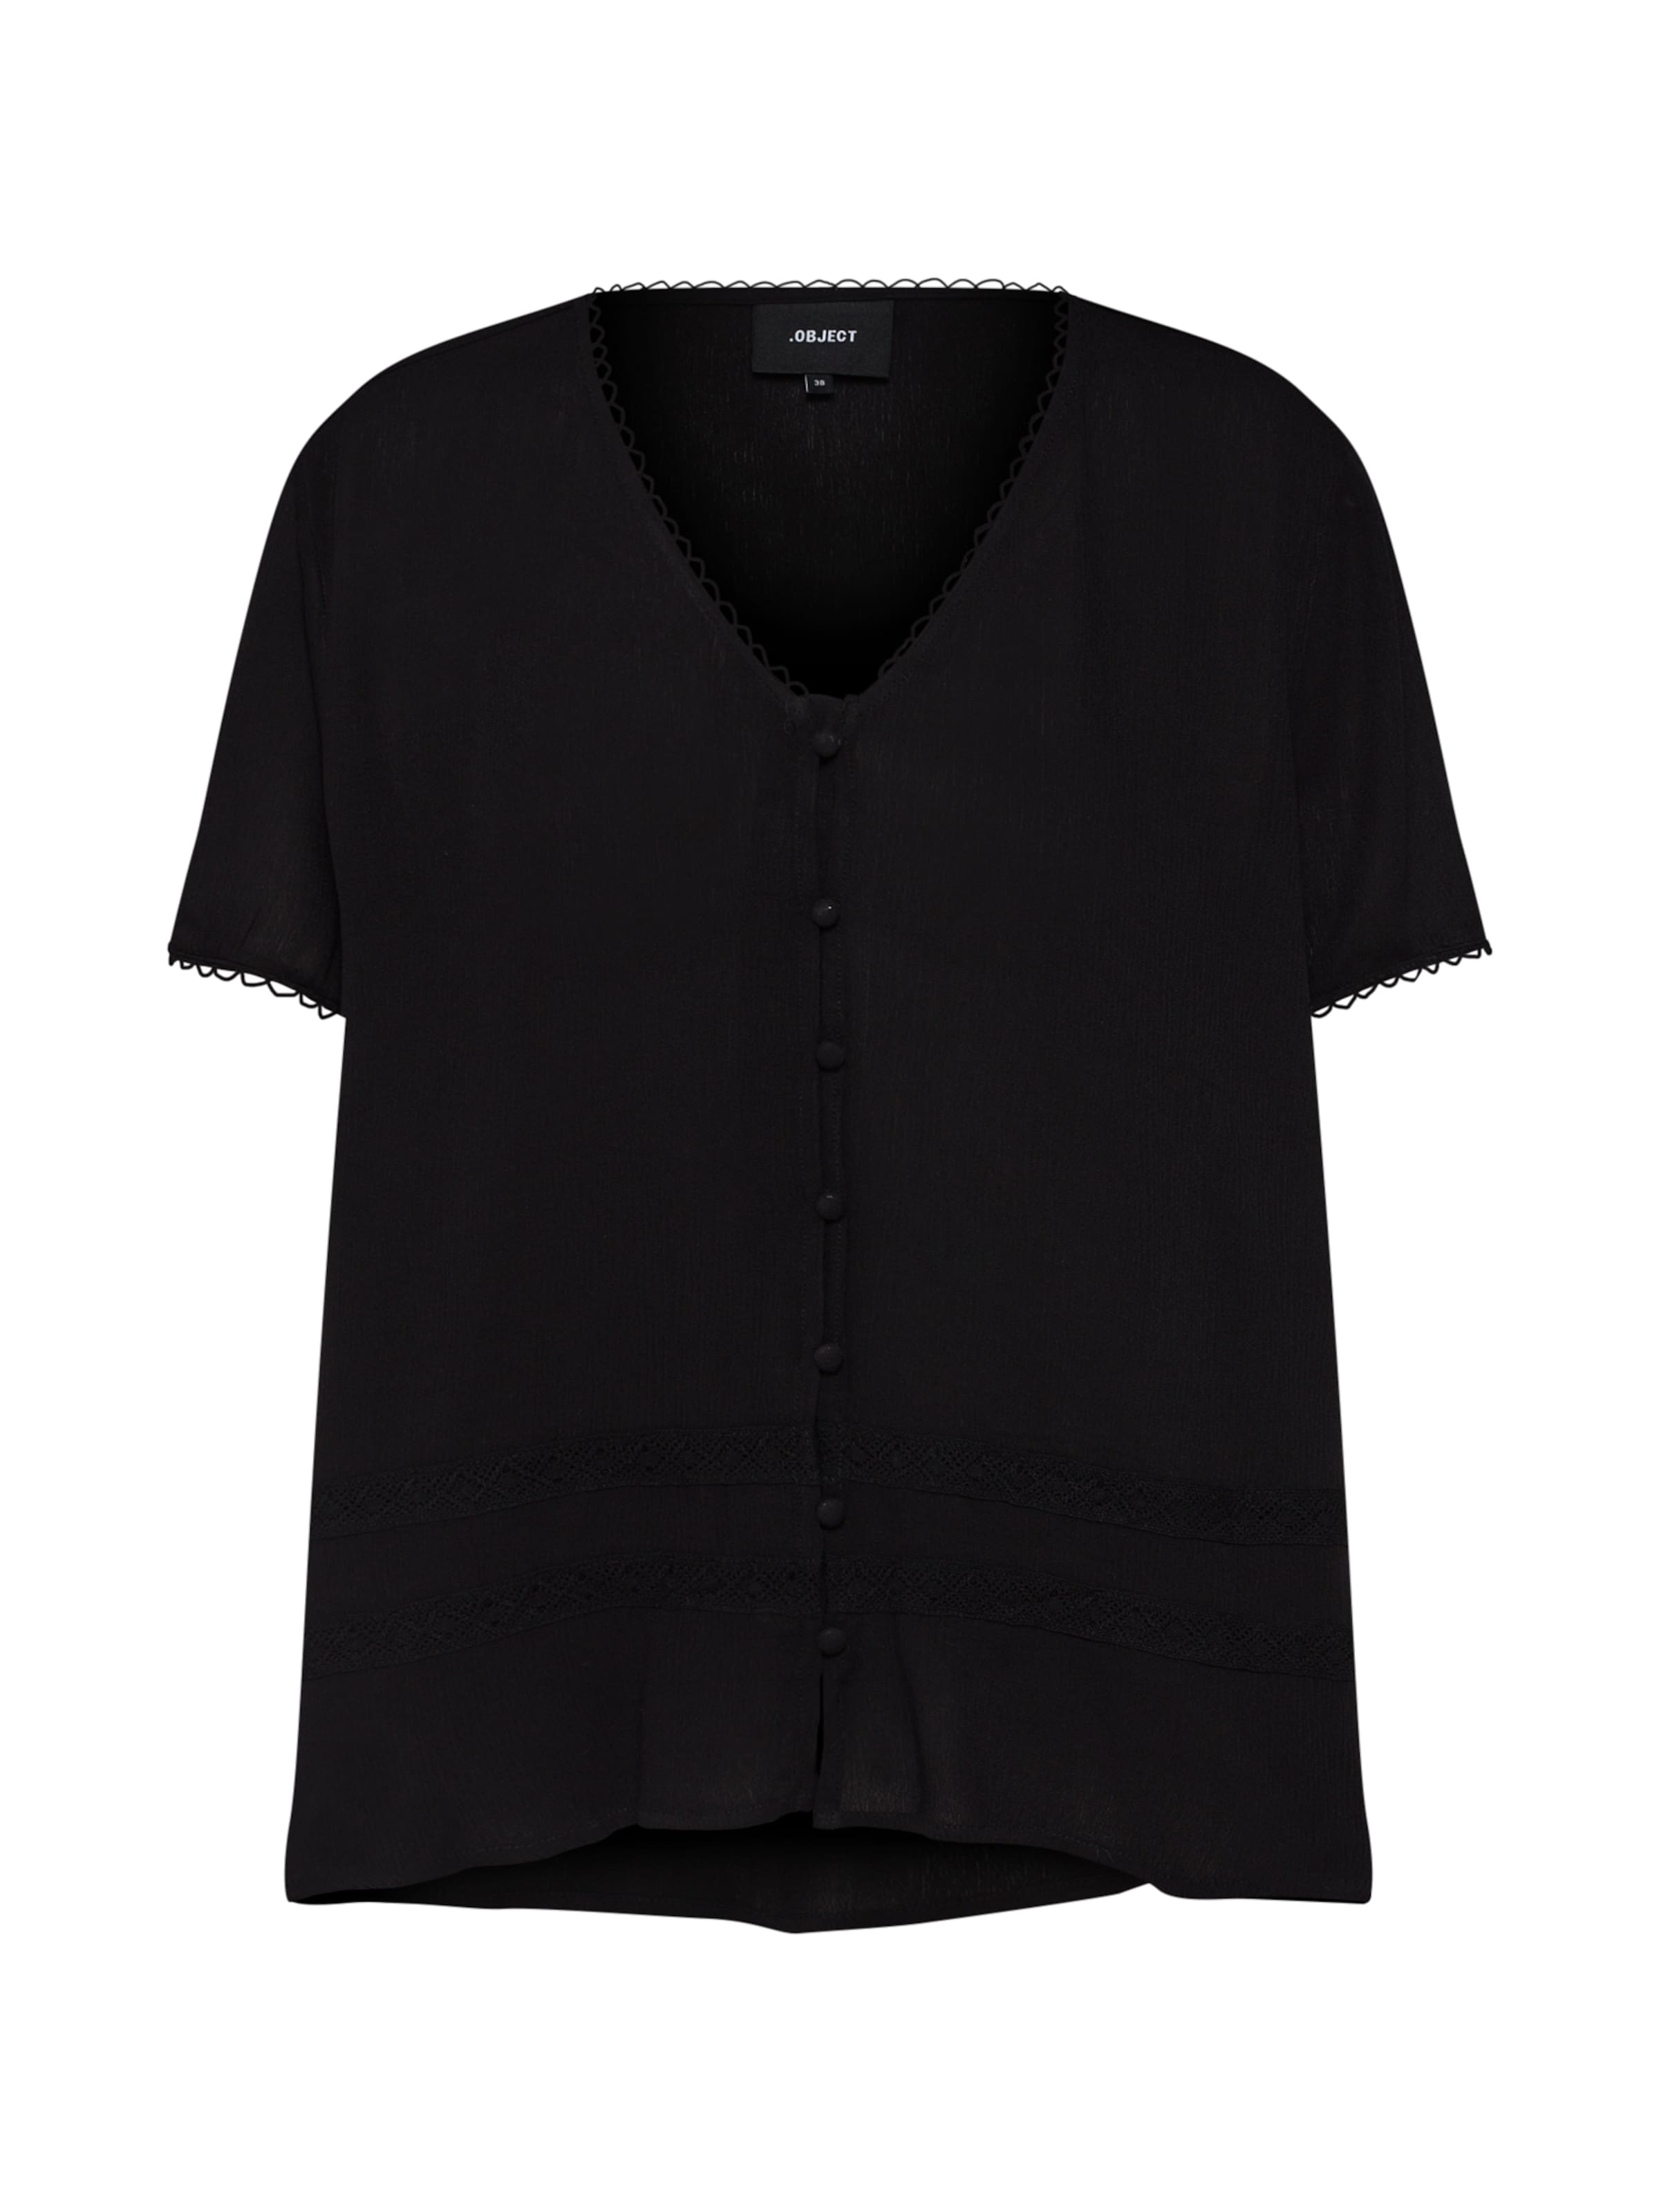 'anette' Object Schwarz Object Schwarz Shirt 'anette' Shirt Shirt In 'anette' Object In drEQCBoxeW